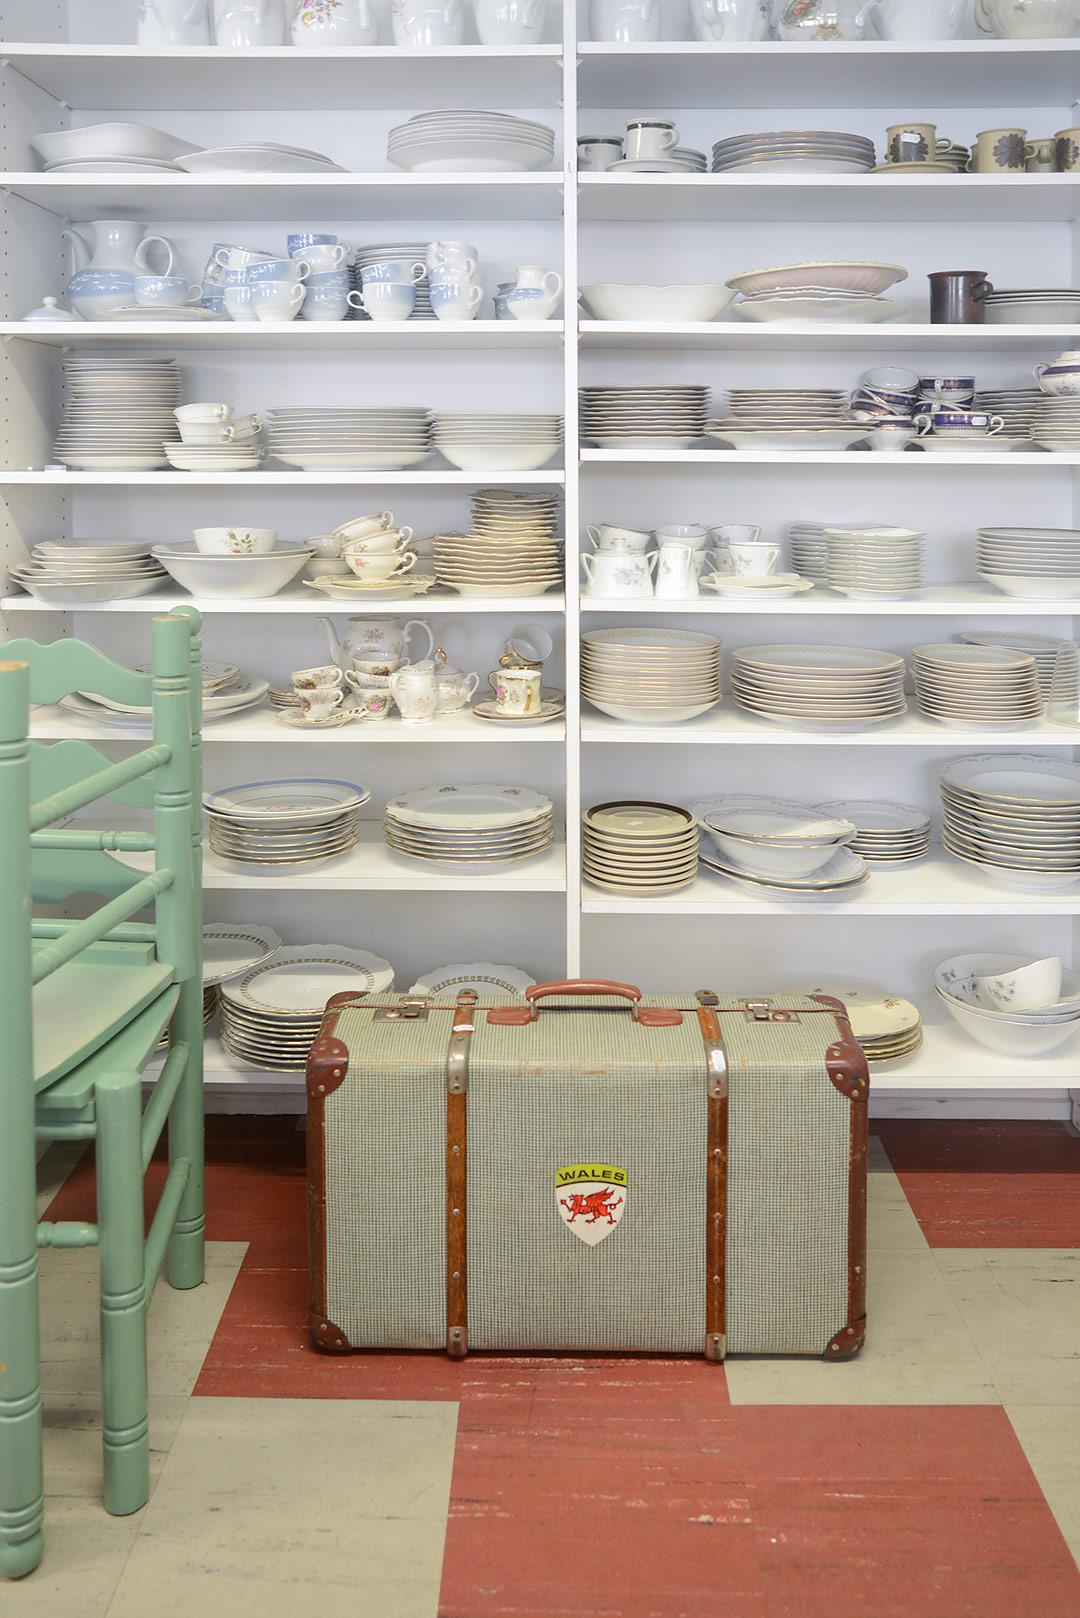 Vintage suitcase and porcelain